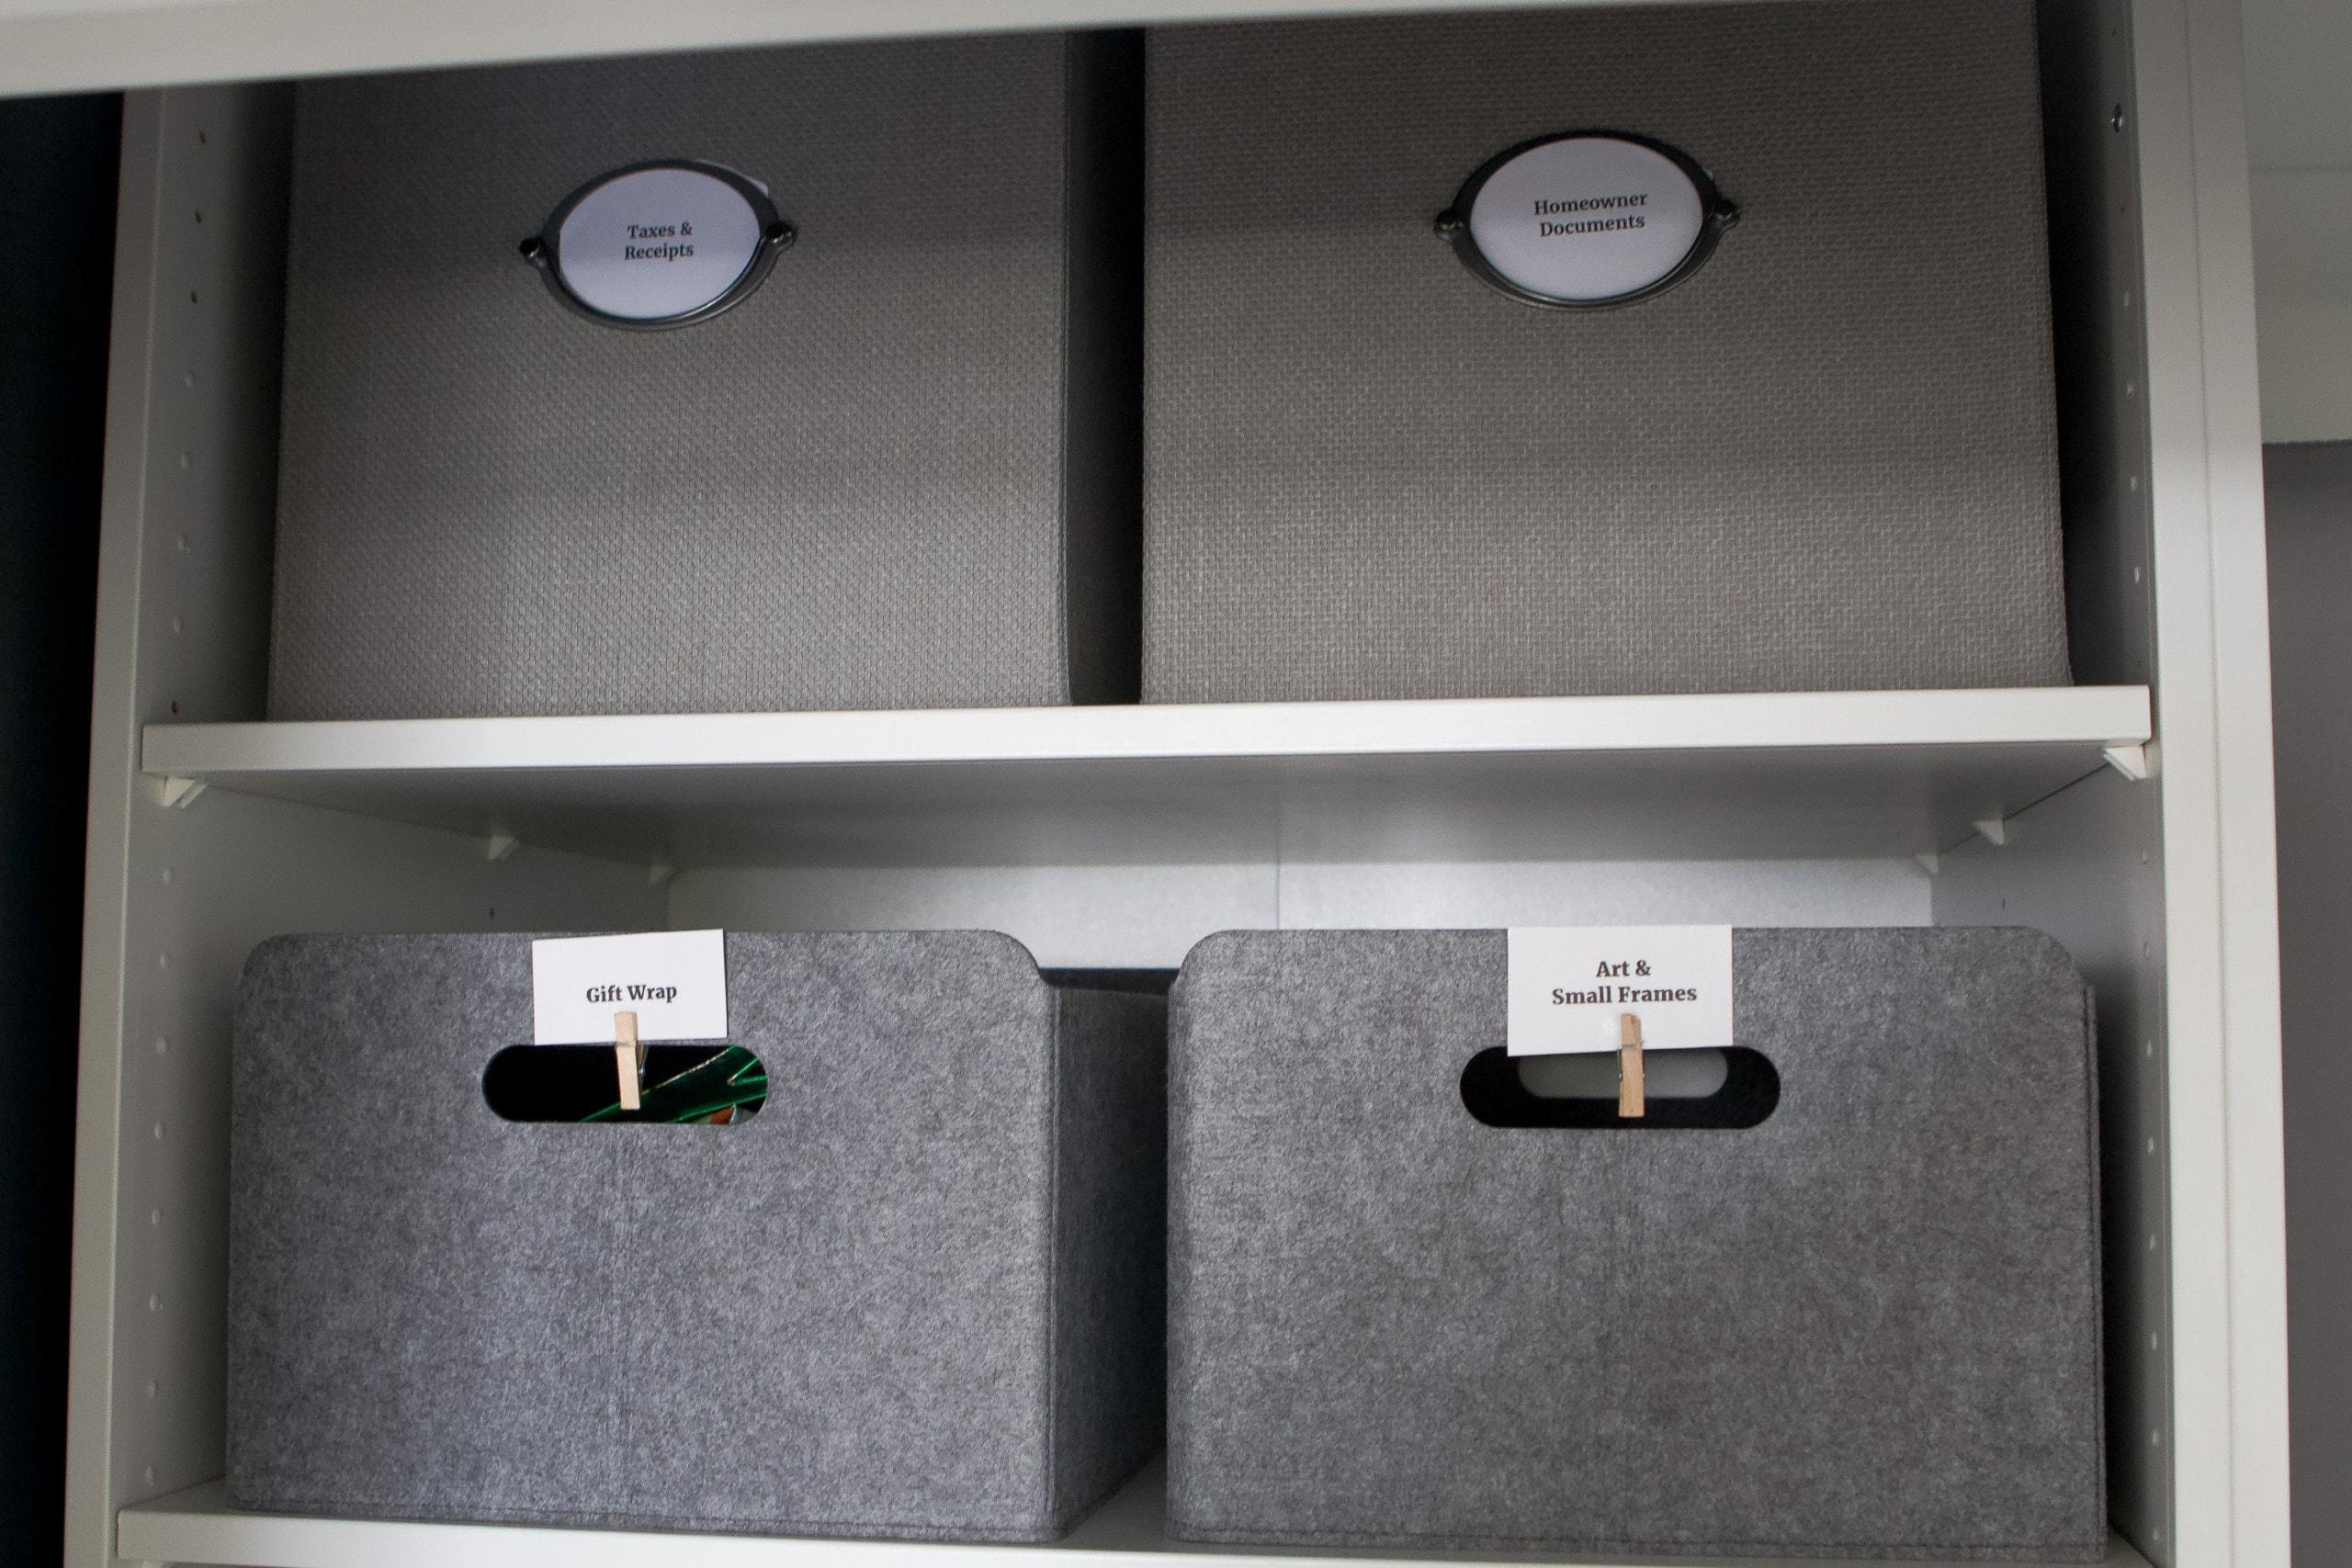 Adding storage file bins